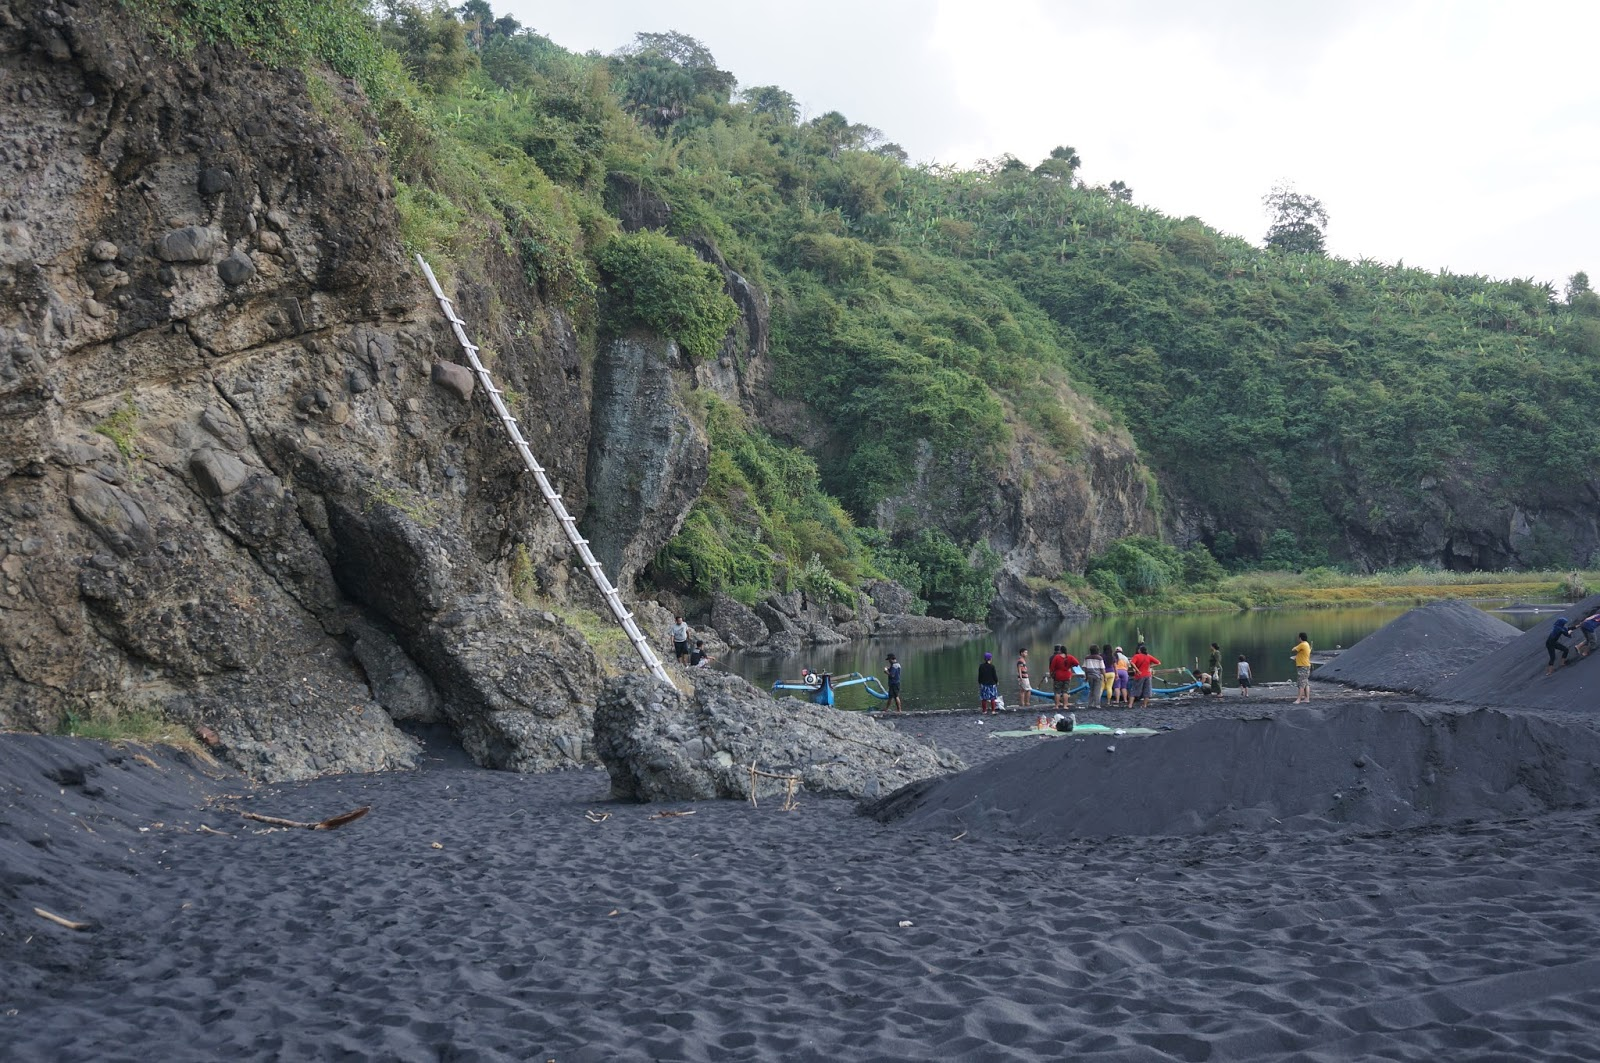 Jalan Pantai Dampar Tempursari Lumajang Danau Bekas Galian Pasir Besi